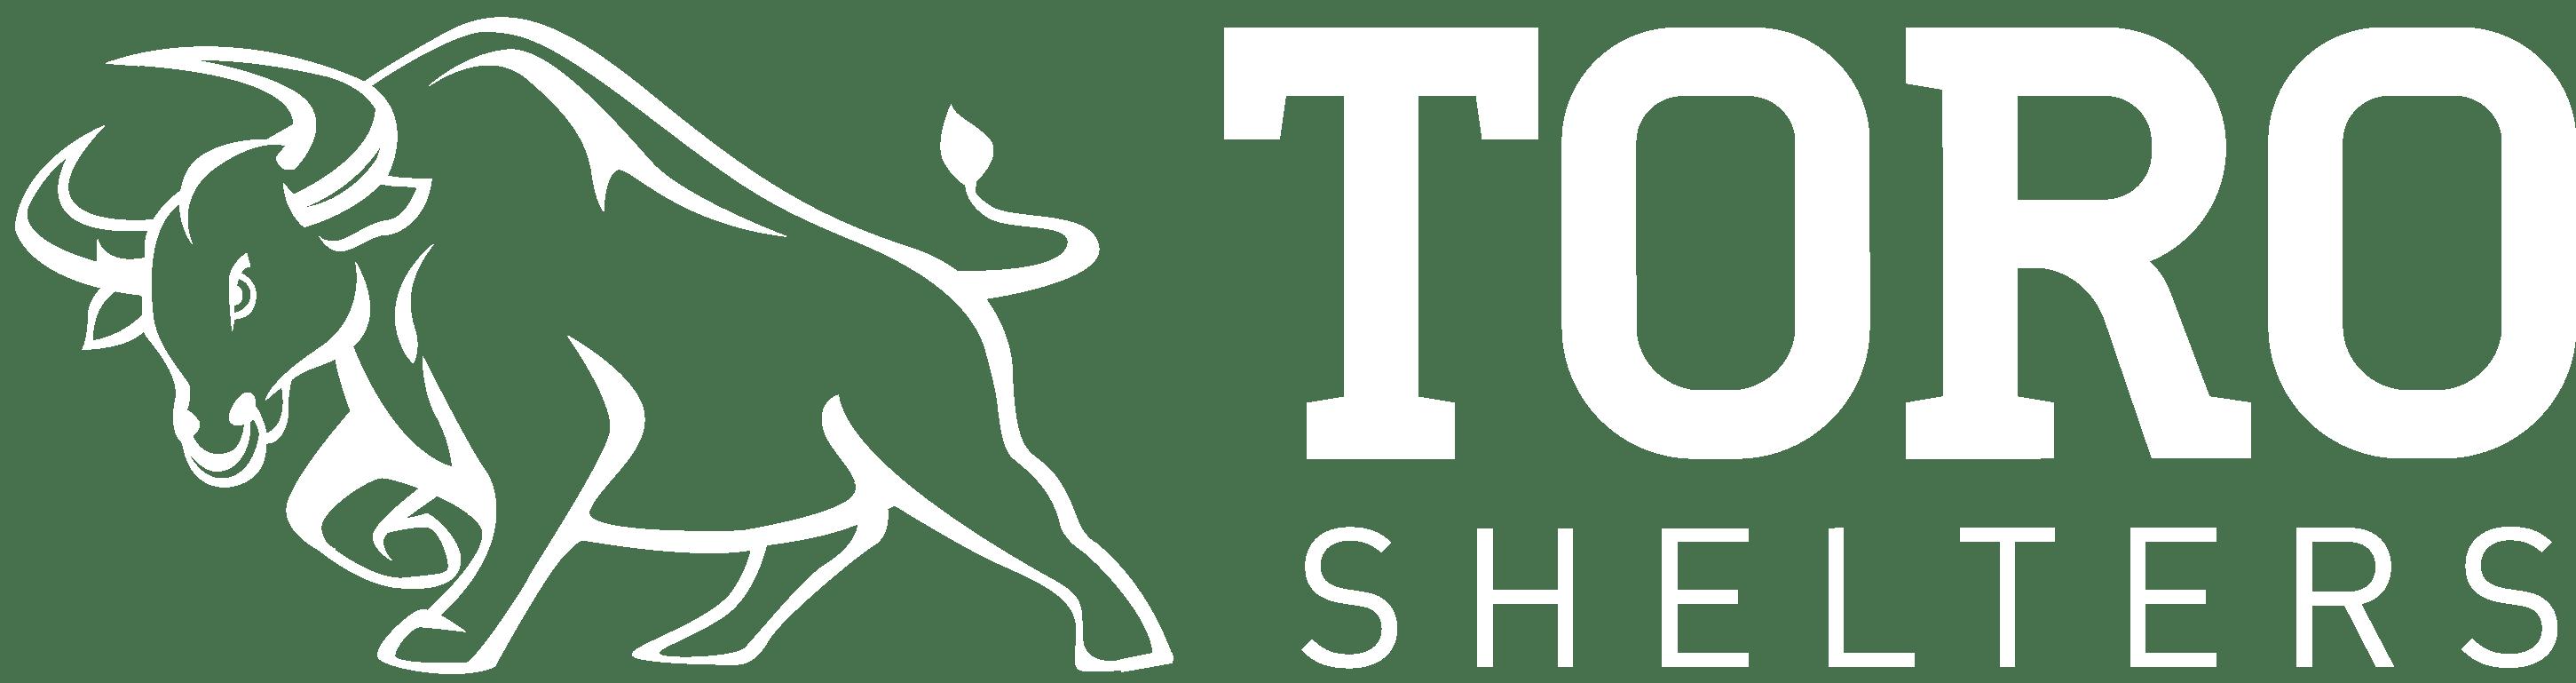 toro shelters white logo